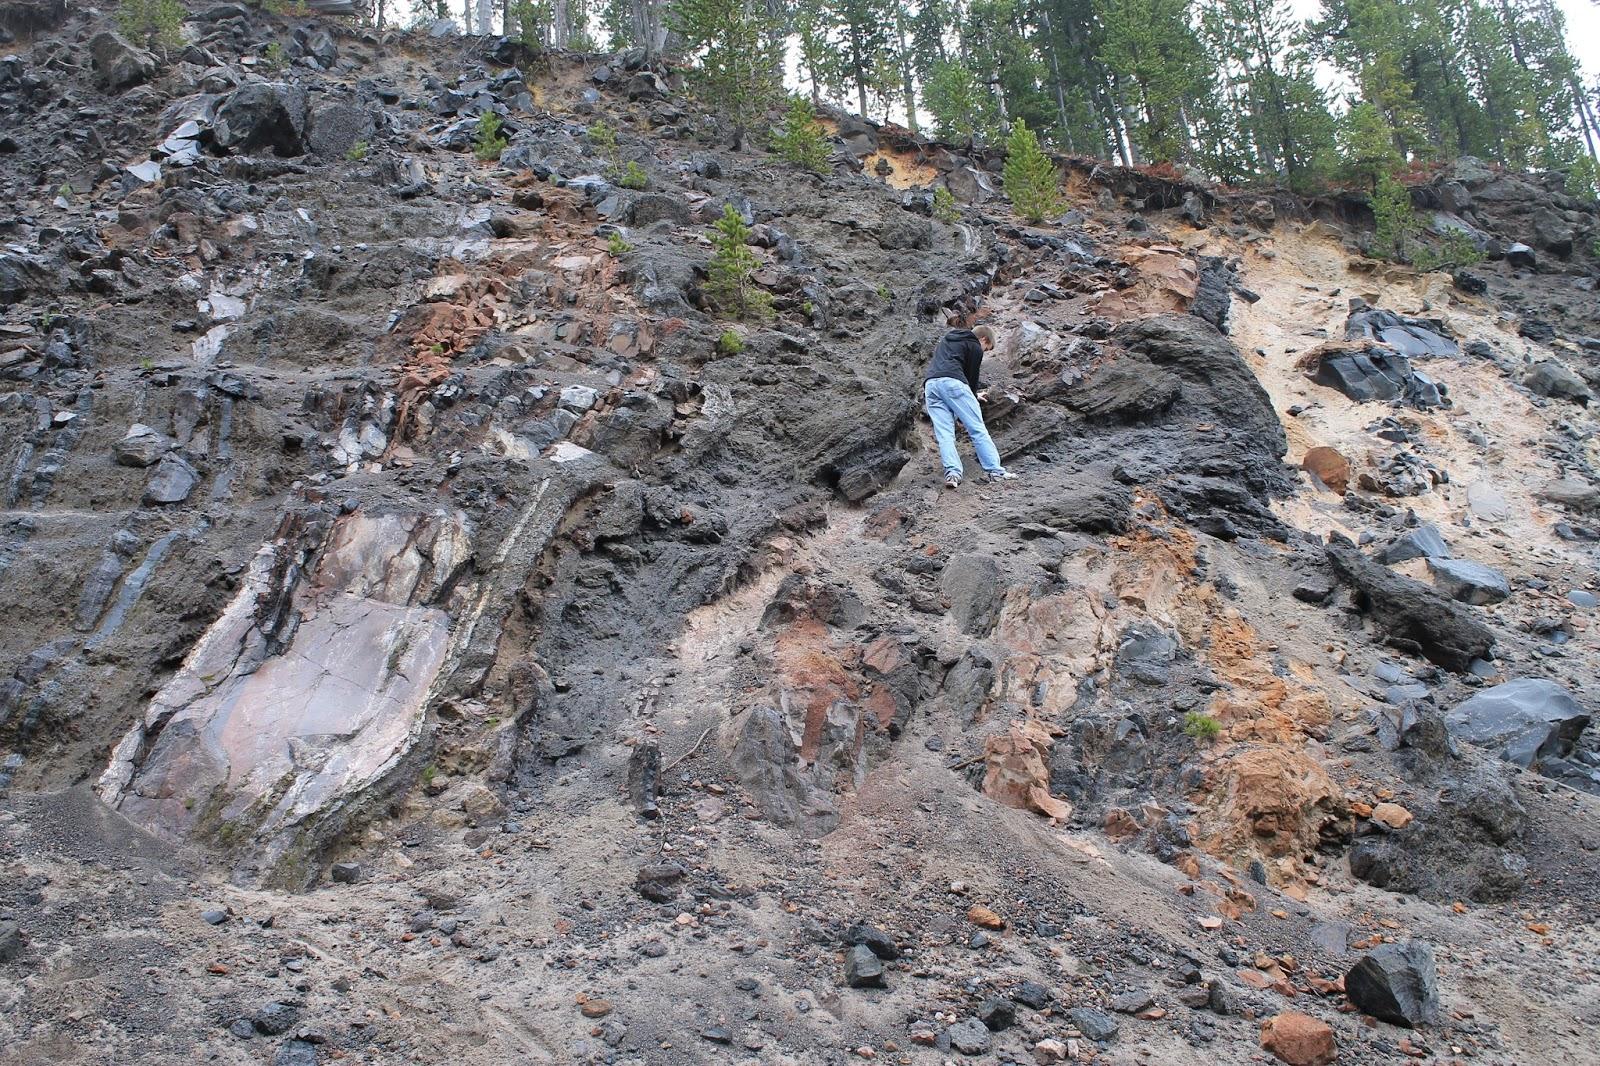 mesa falls island park yellowstone idaho geology travel fieldtrip rocdoctravel.com